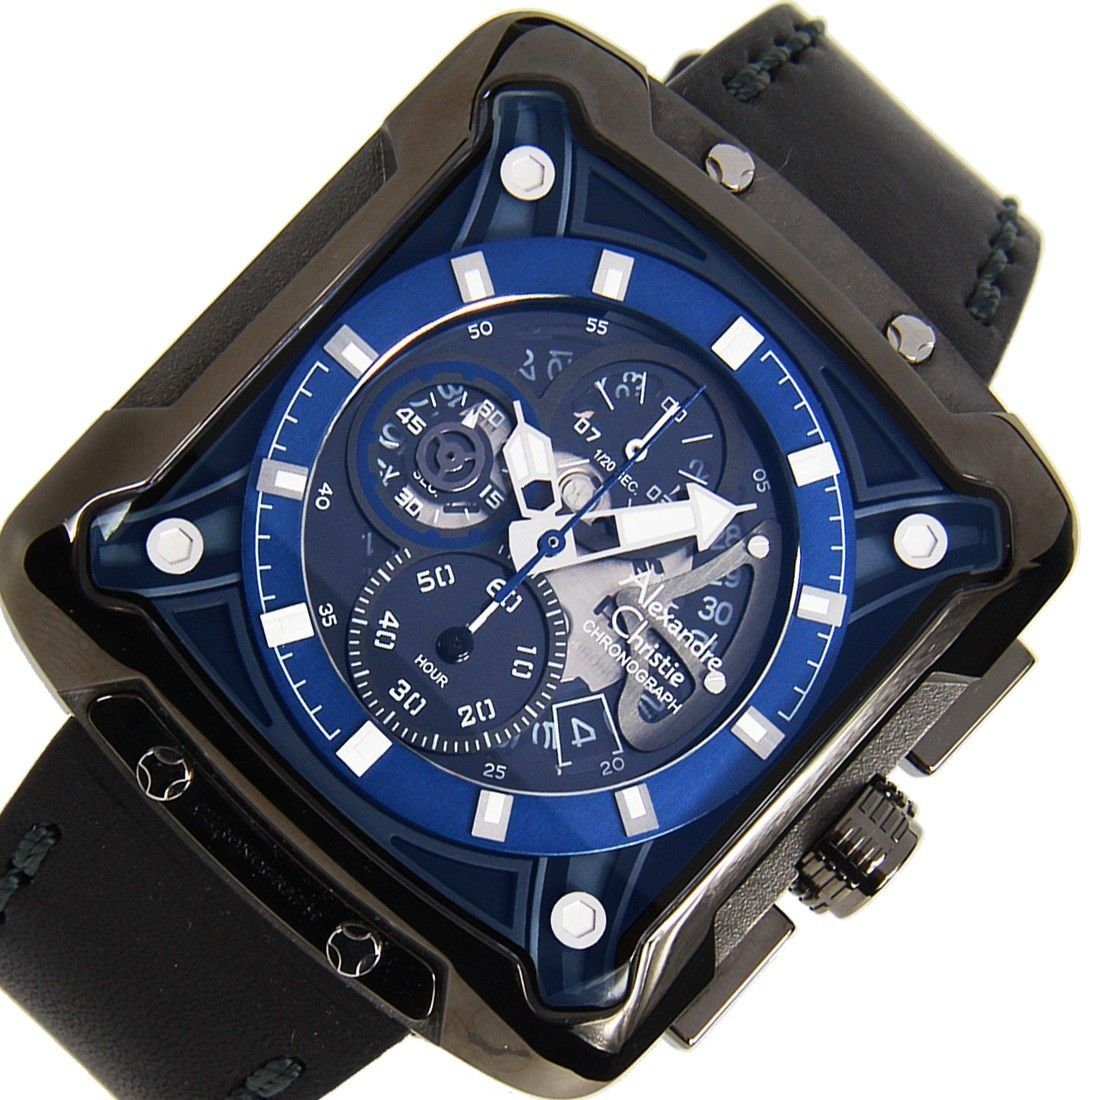 3030MCLIGBU Alexandre Christie Chronograph Male Watch